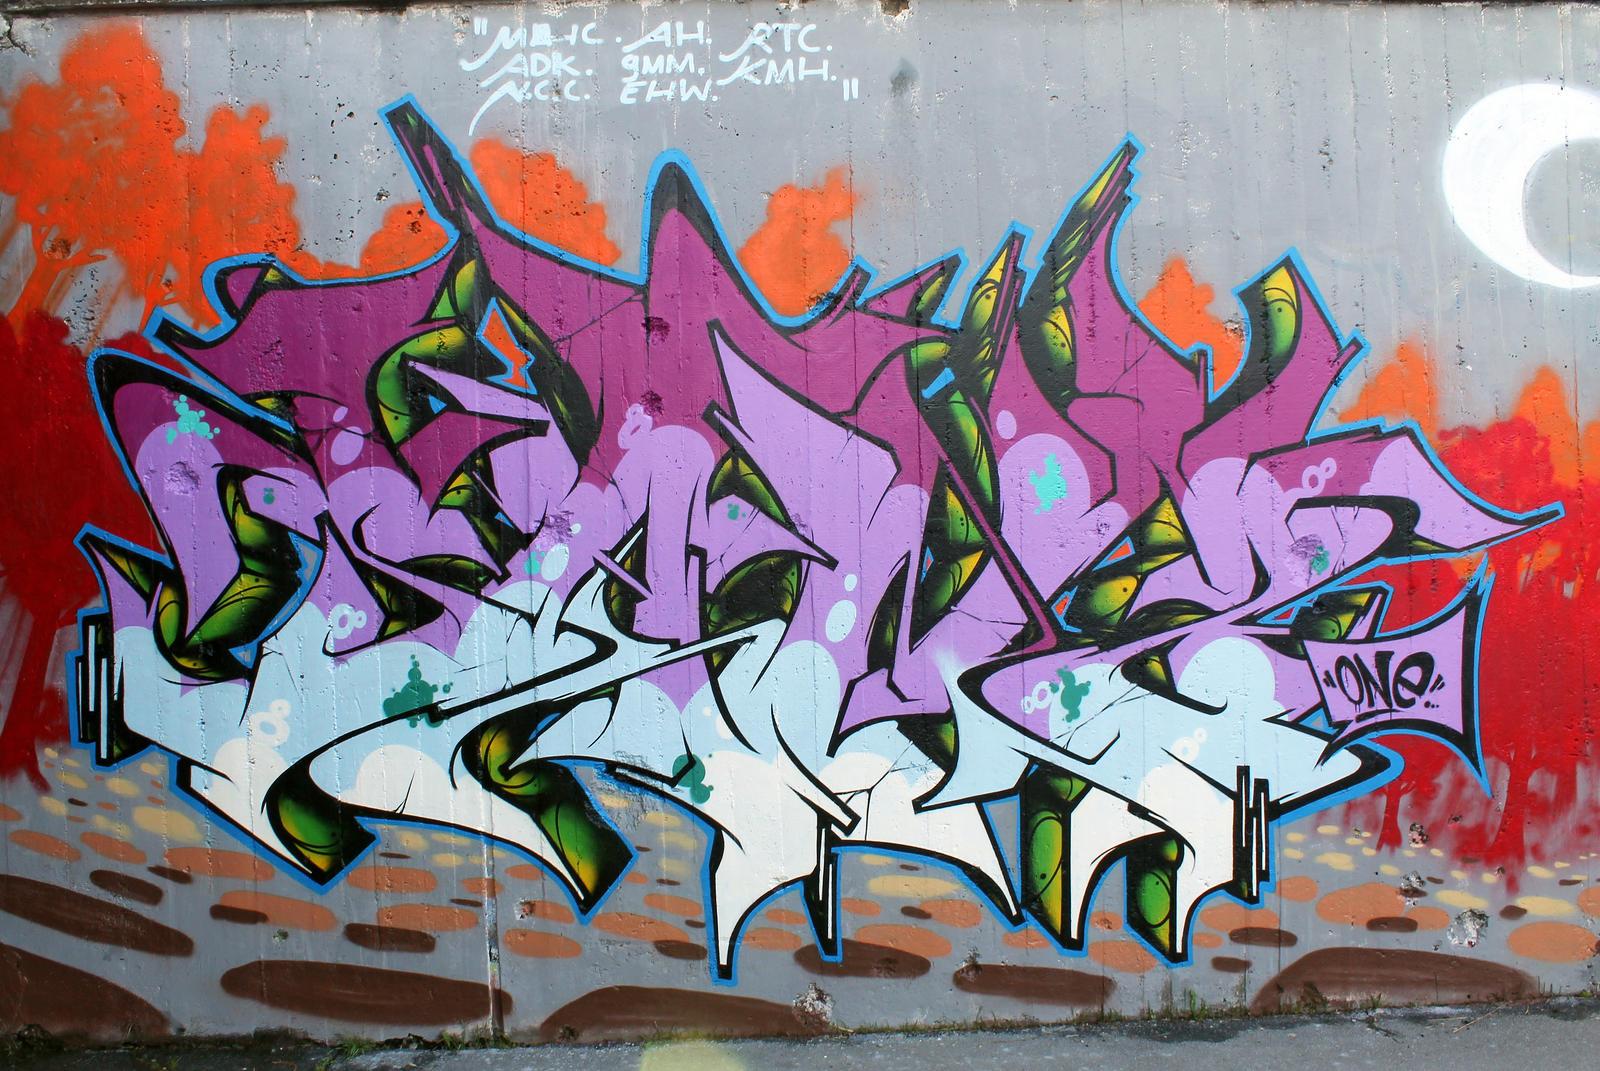 SANZ ONE - SB GRAFFITI FEST 2013 by SANS-01-2-MHC-BS